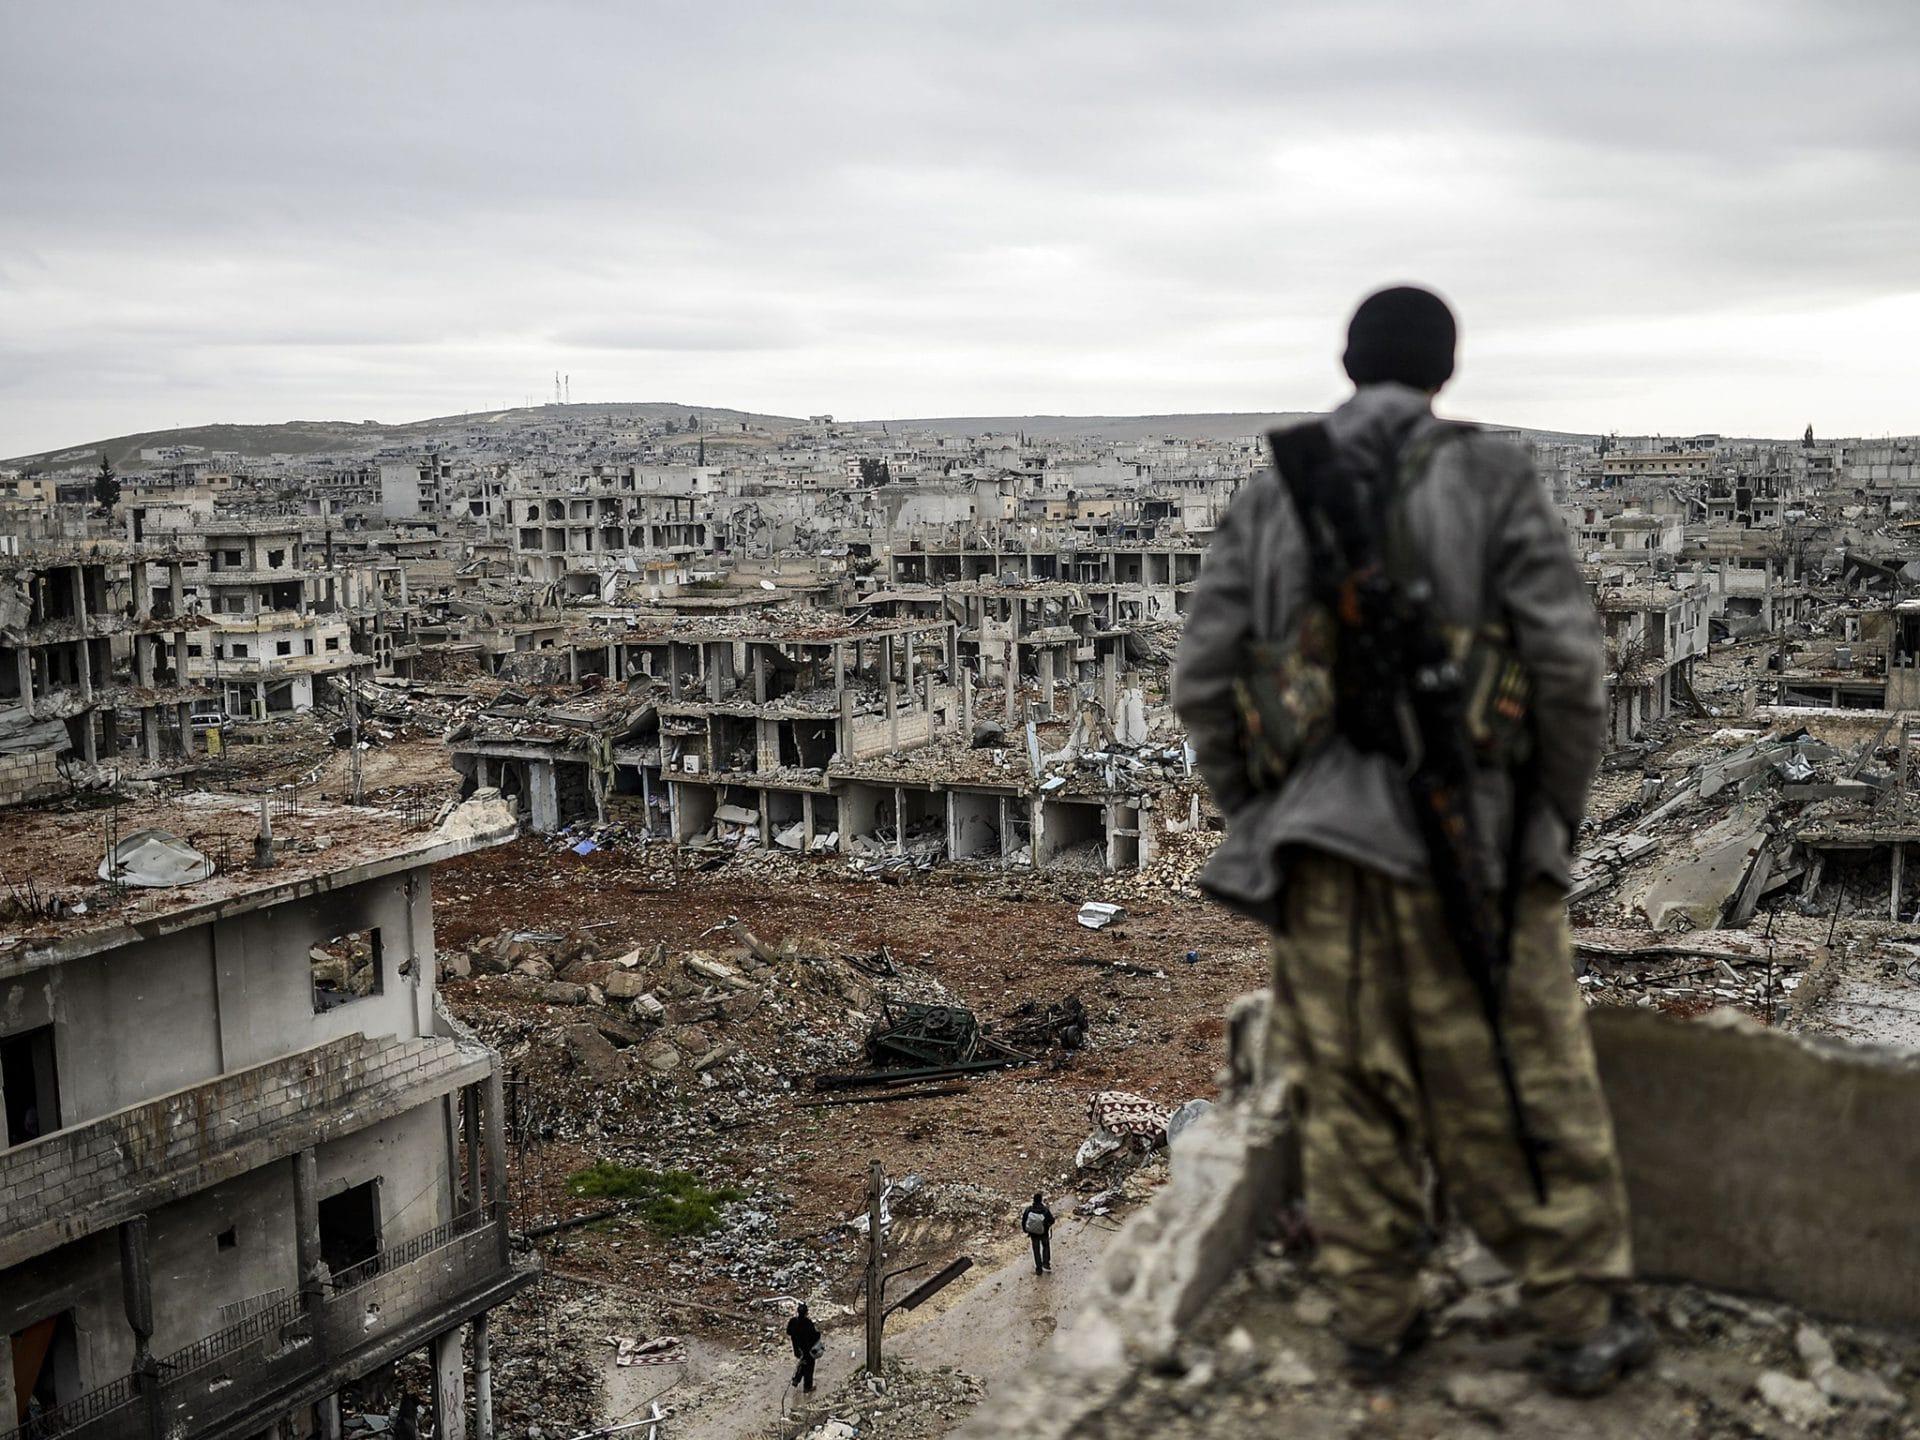 War-Torn Syria – Can Saudi Arabia Broker Peace?, War-Torn Syria – Can Saudi Arabia Broker Peace?, Middle East Politics & Culture Journal